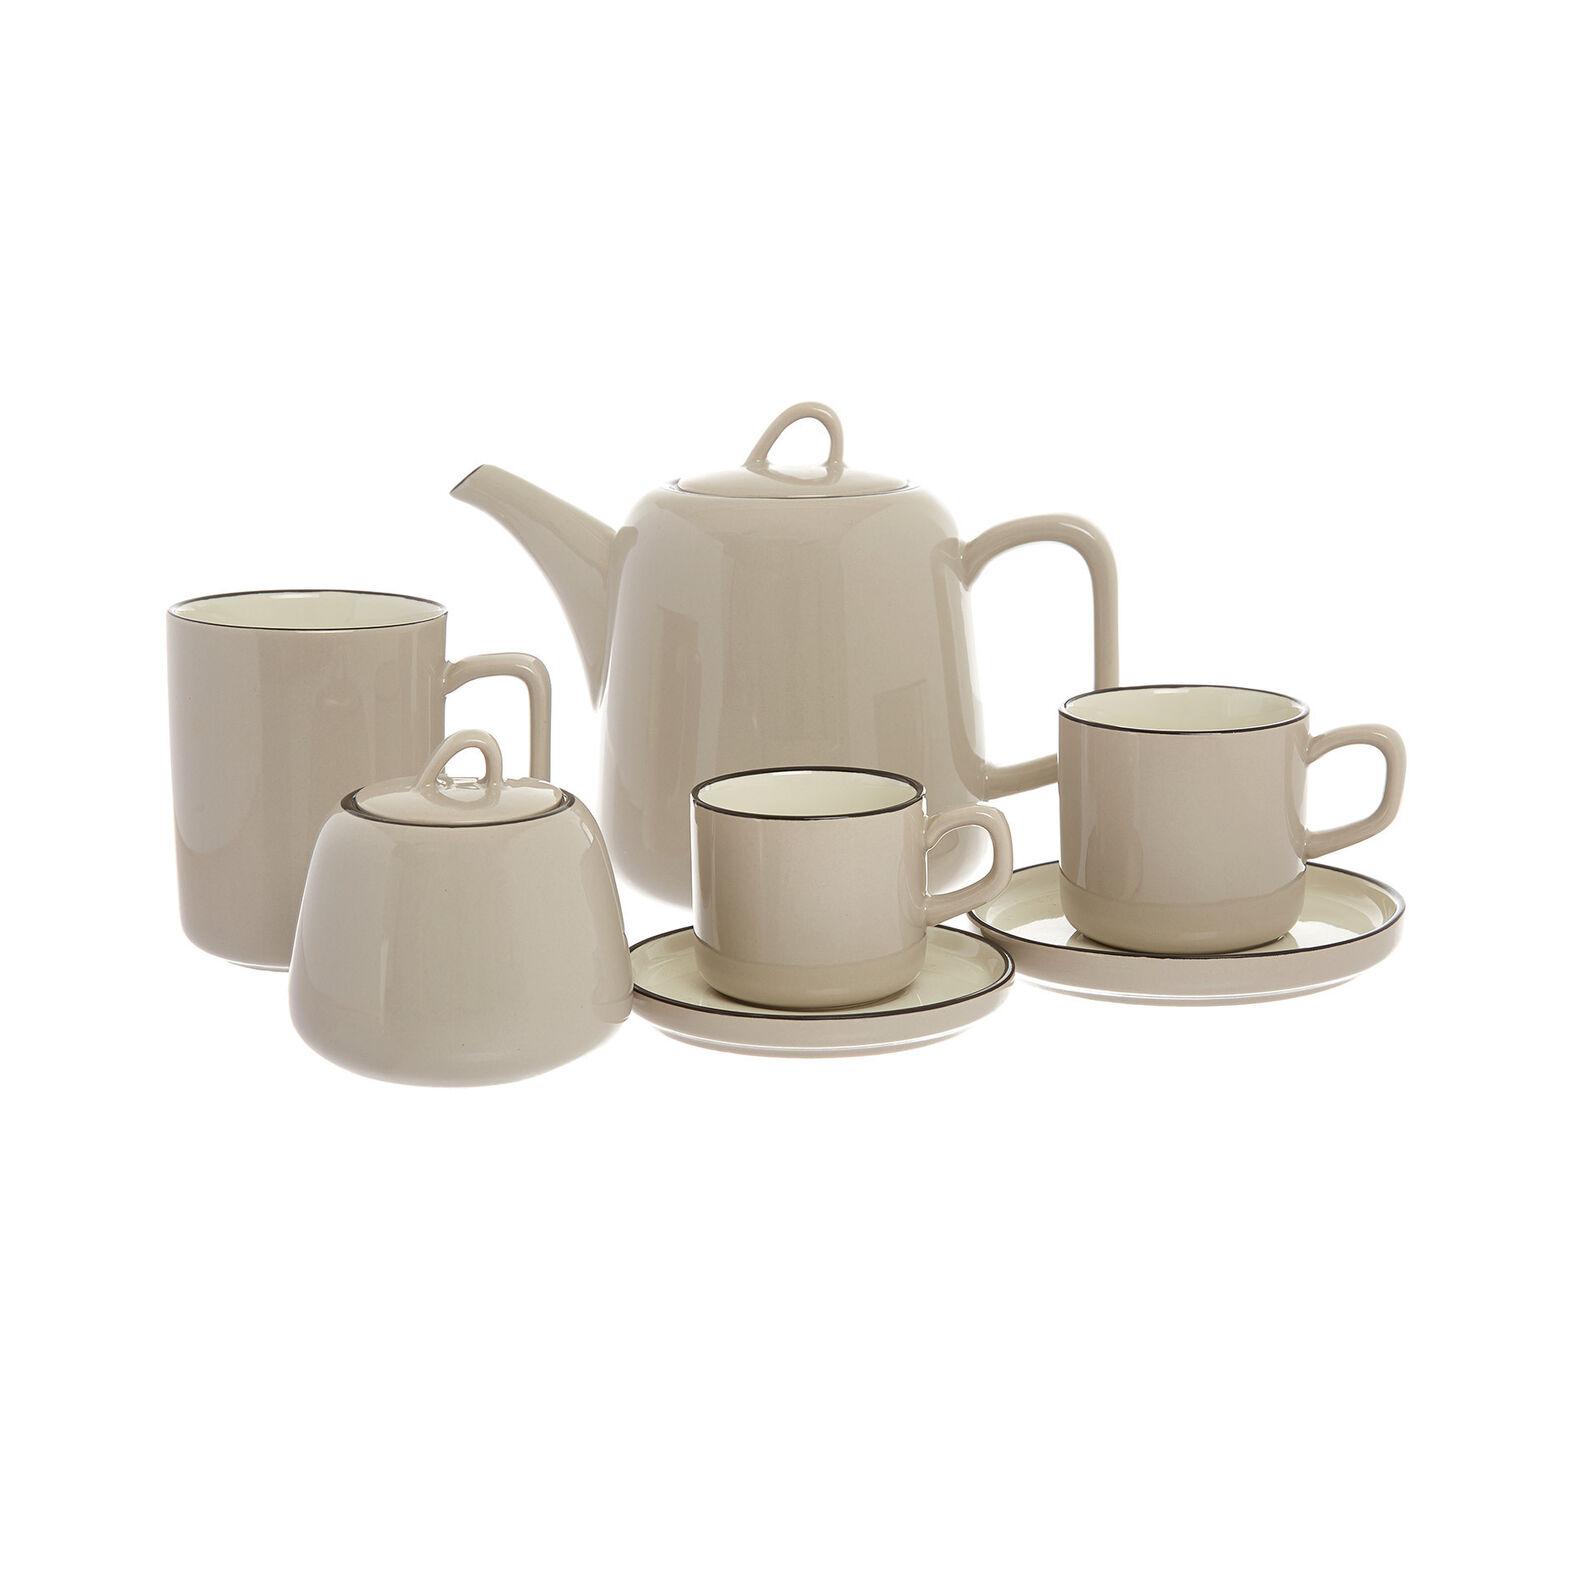 Hard glossy ceramic coffee cup